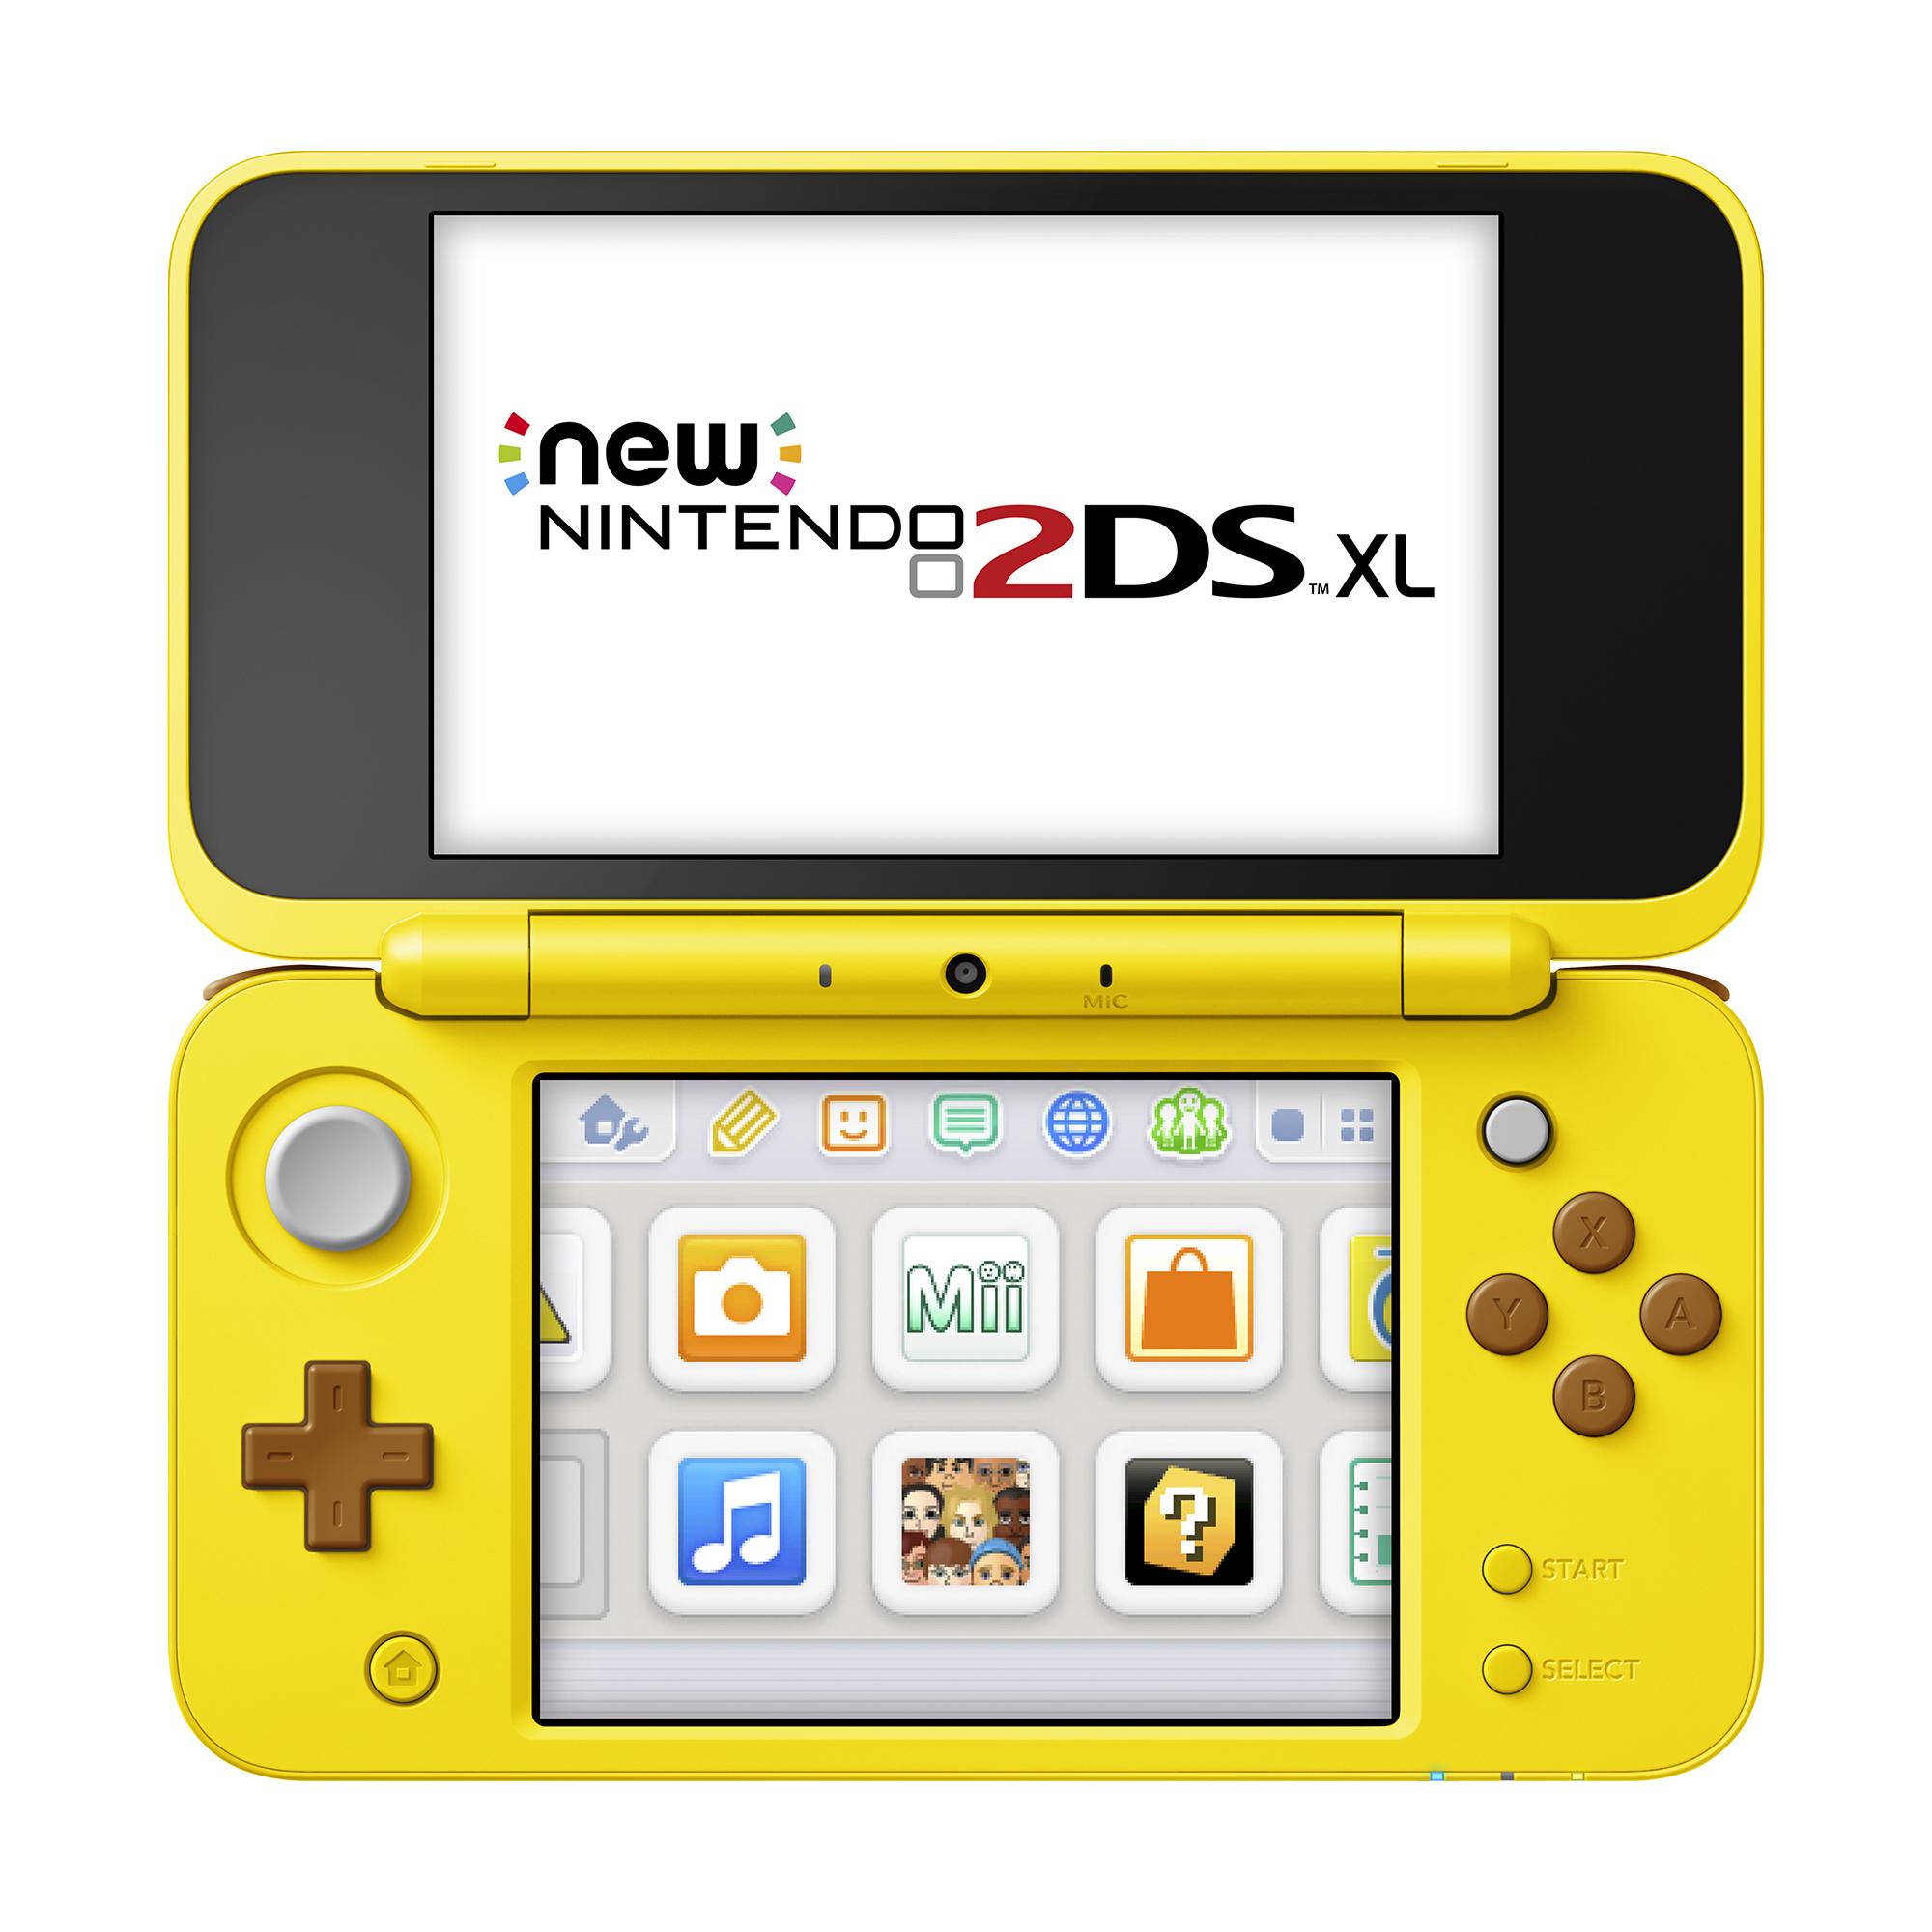 ToysRUS Nintendo 2DS XL Pikachu Edition 15% off $135.99 B&M YMMV Brand New